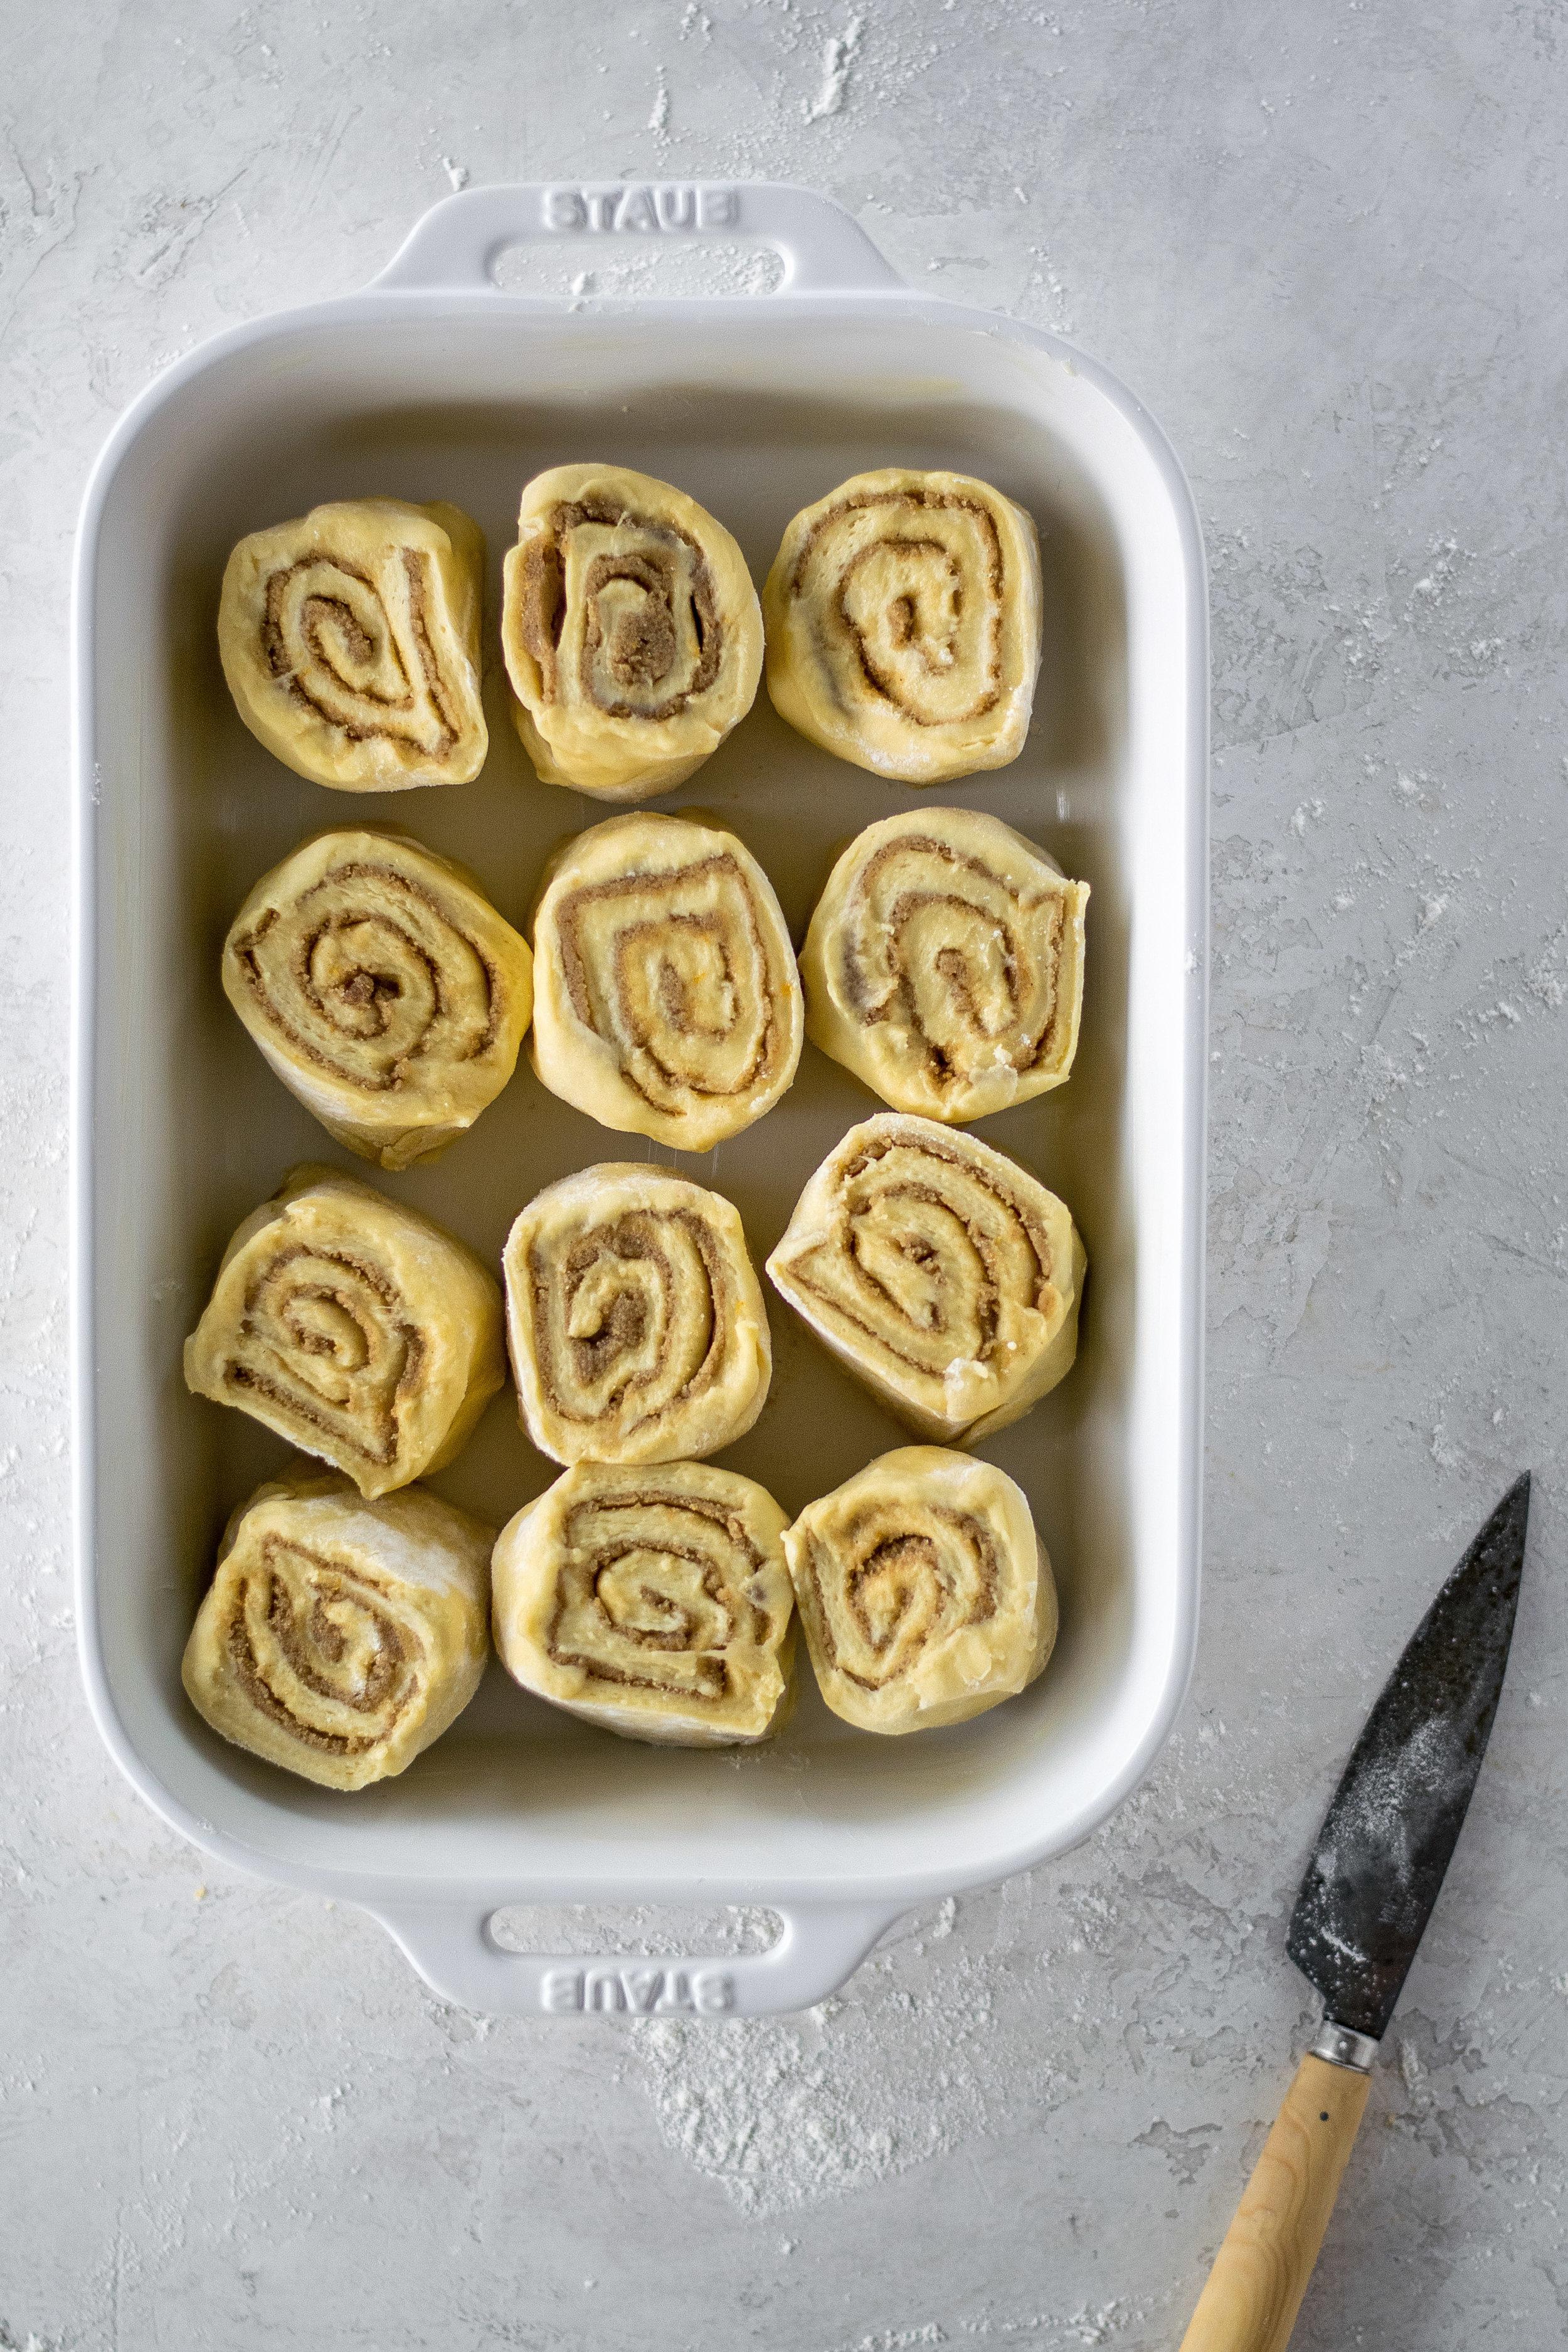 Cardamom Orange Morning Rolls with Orange Blossom Cream Cheese Frosting | All Purpose Flour Child